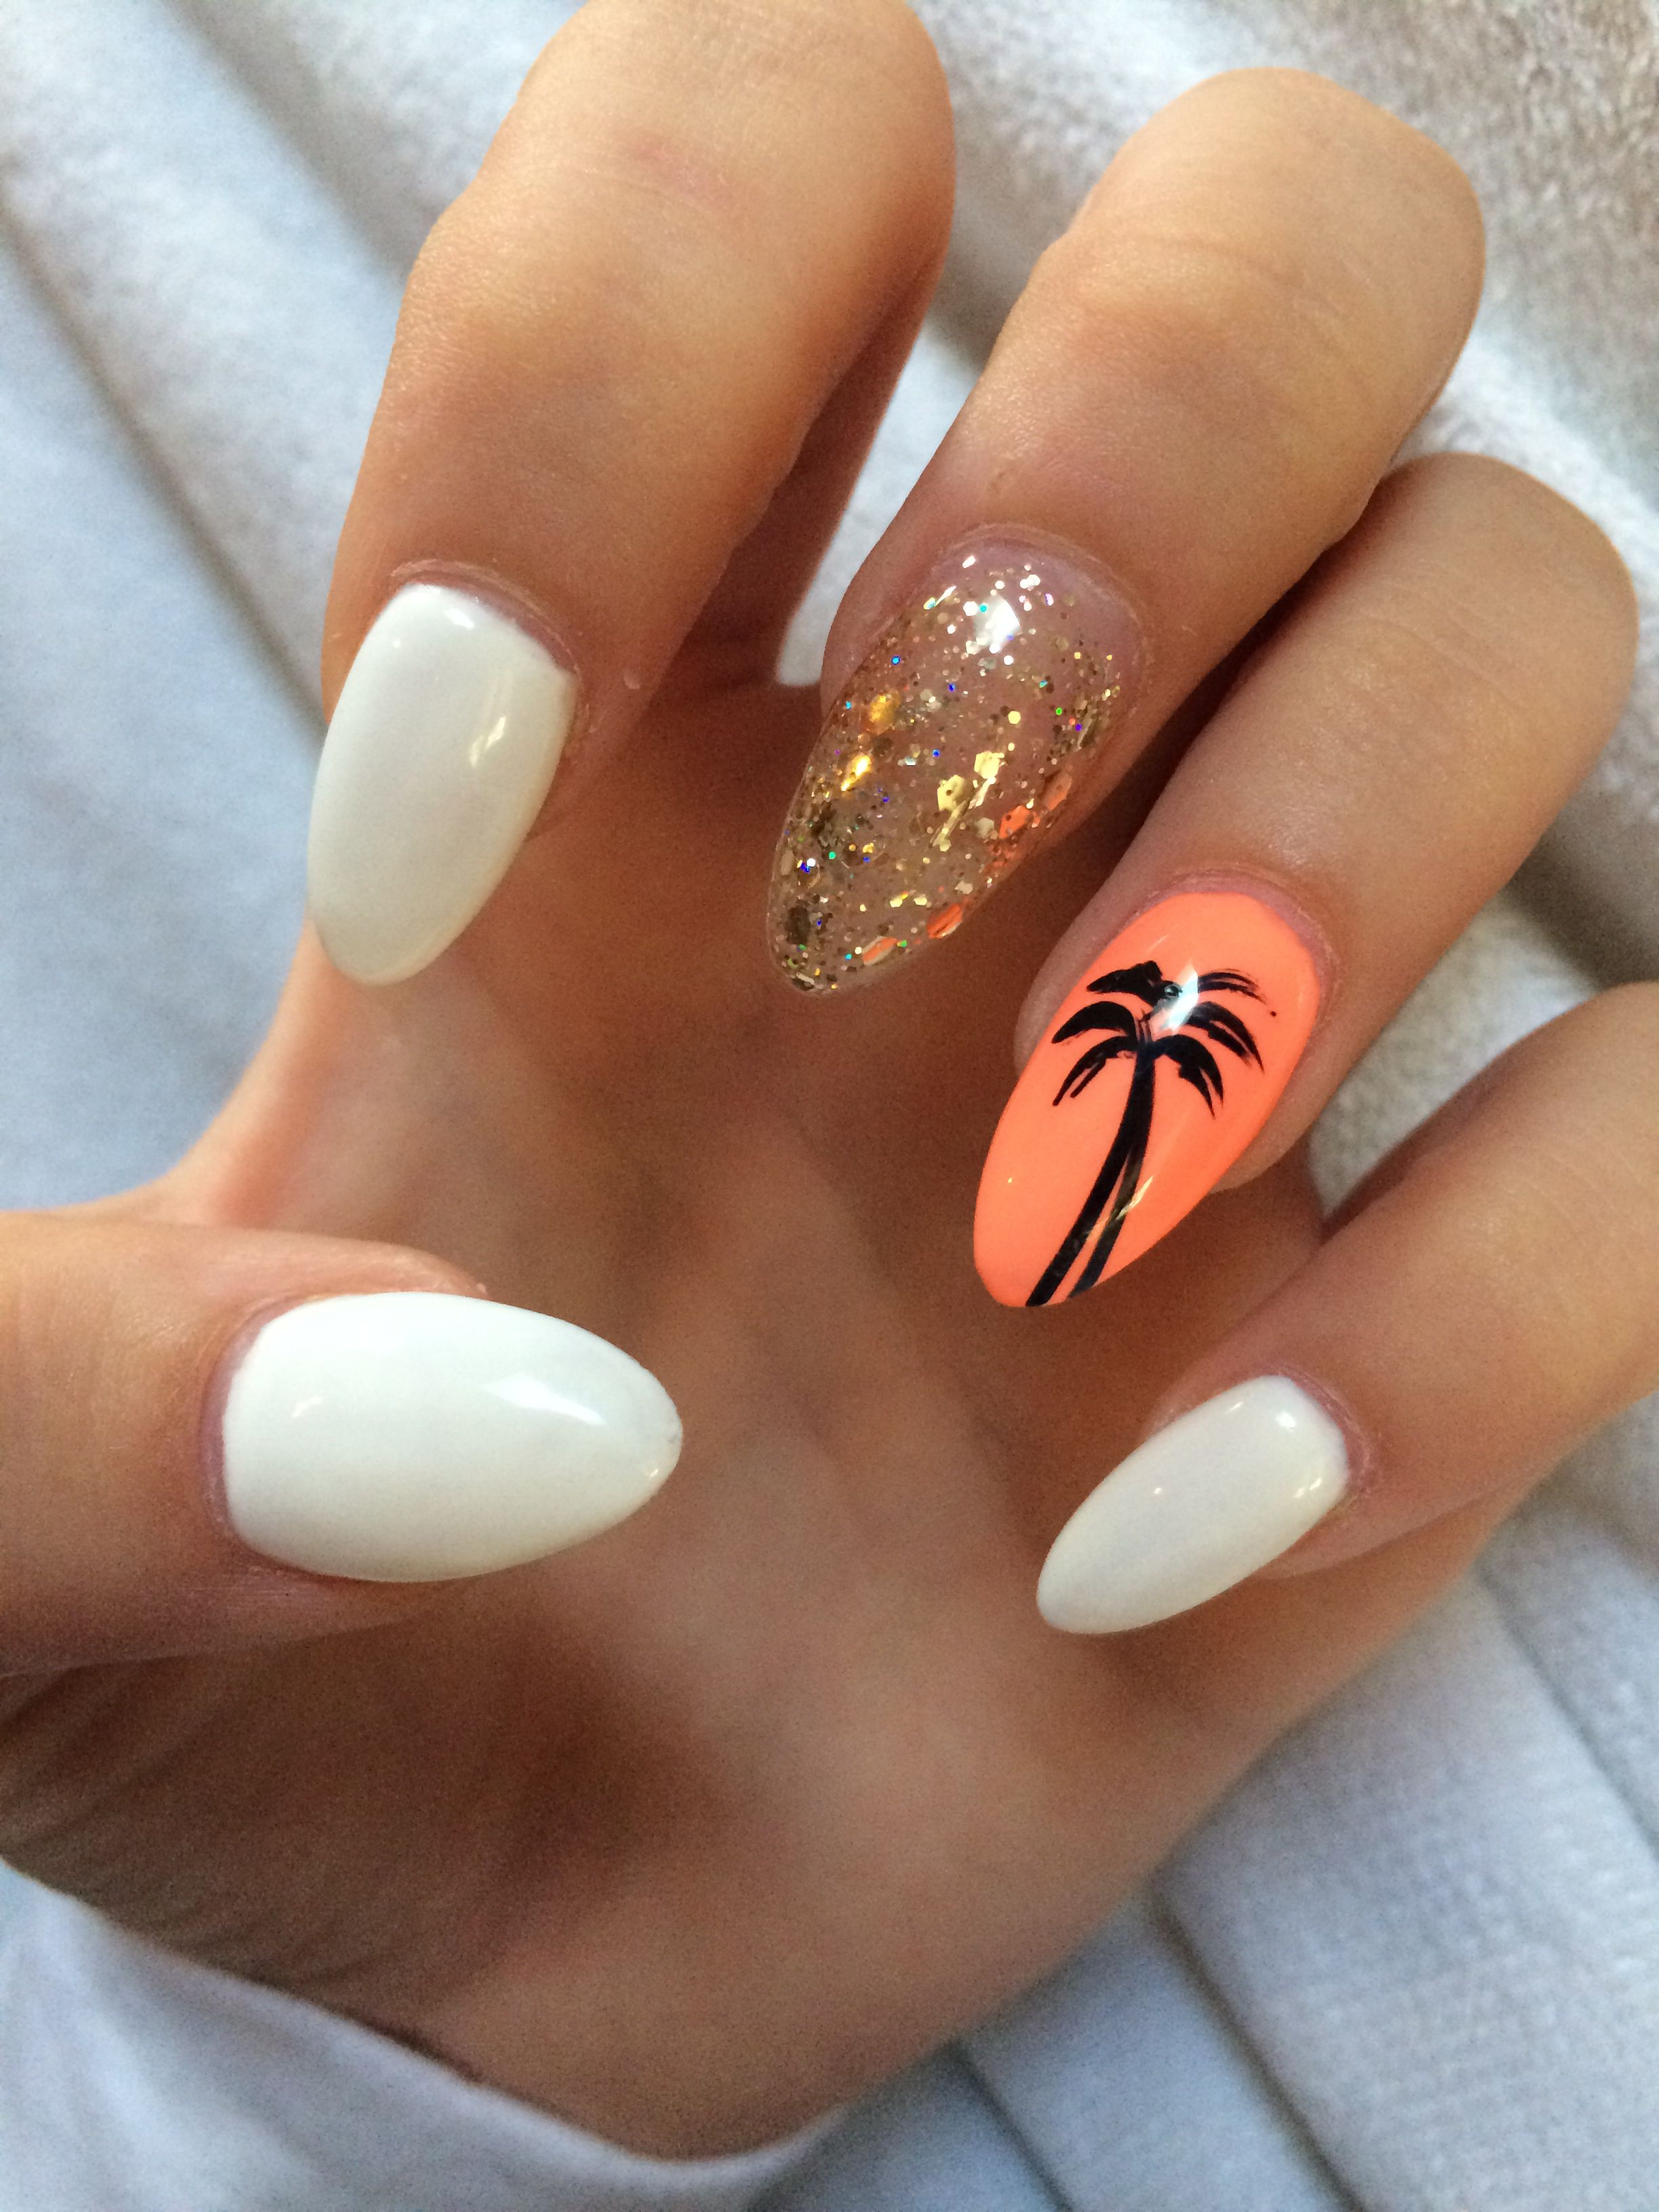 Vacation nails loveeee pinterest vacation nails vacation nail inspo prinsesfo Gallery